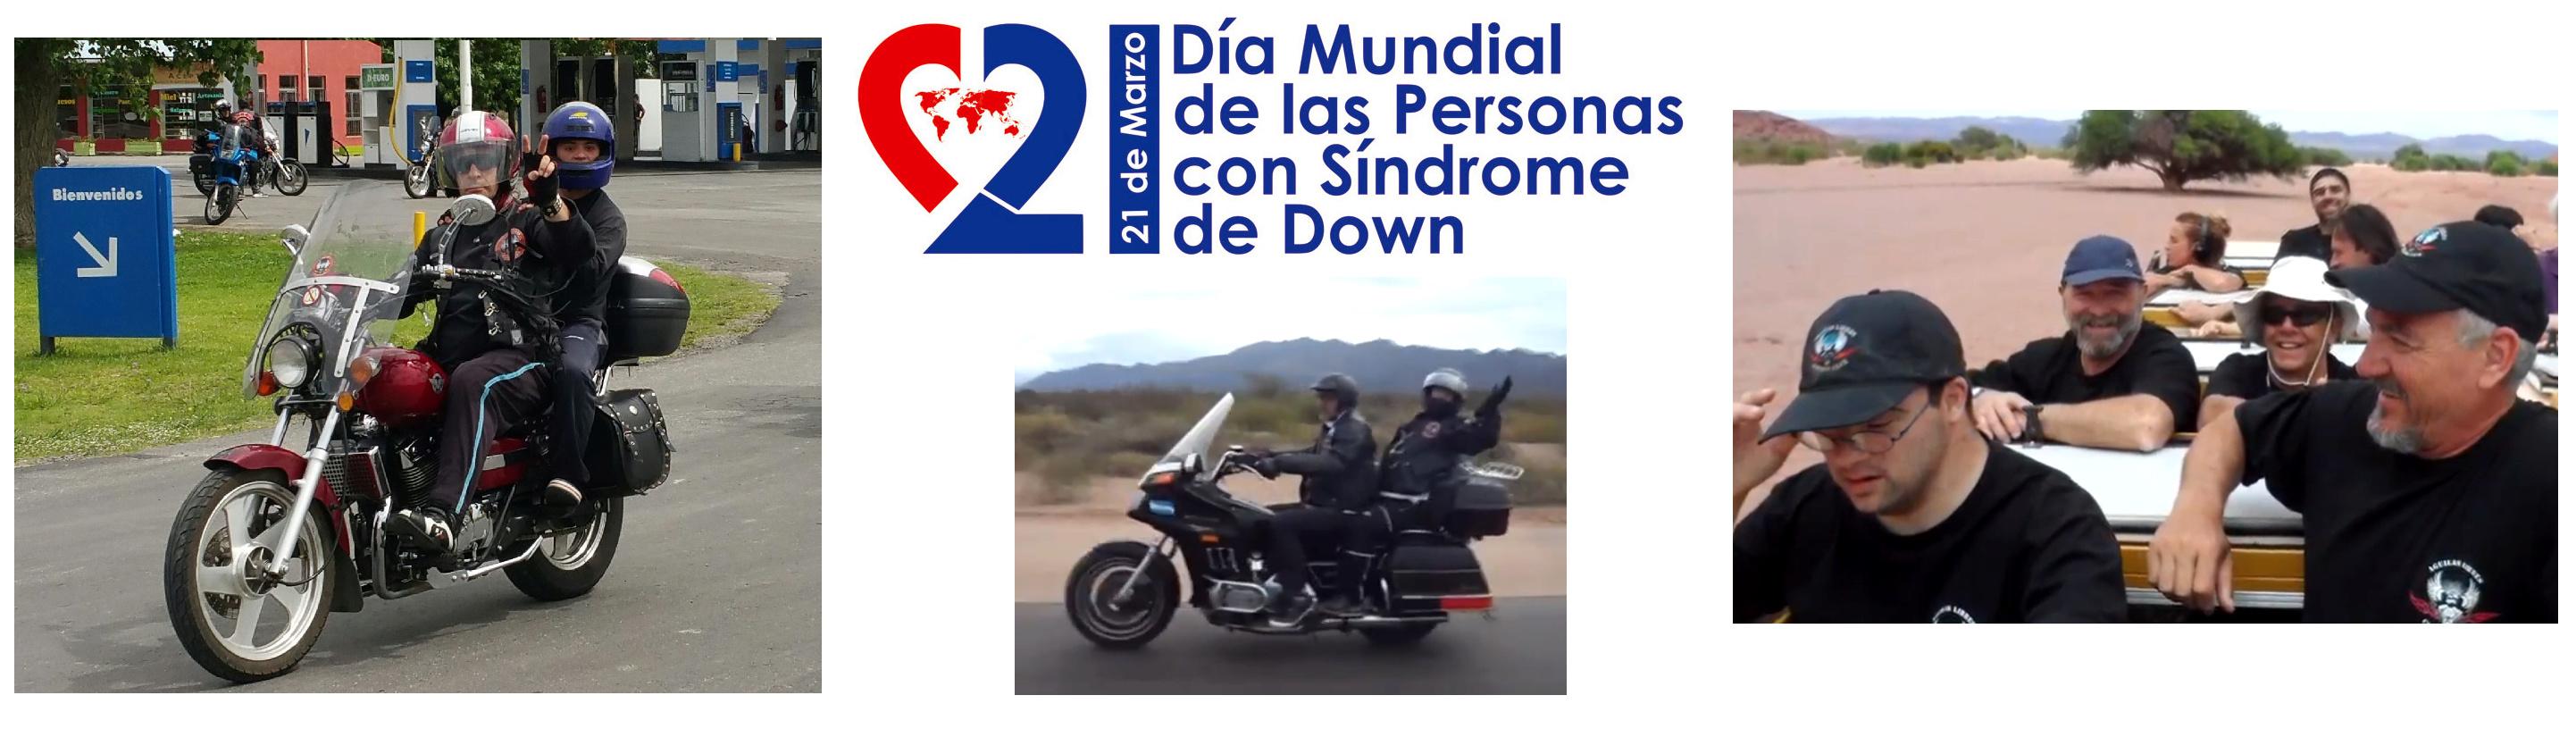 21 de Marzo - Día mundial del síndrome Down. Nacho10